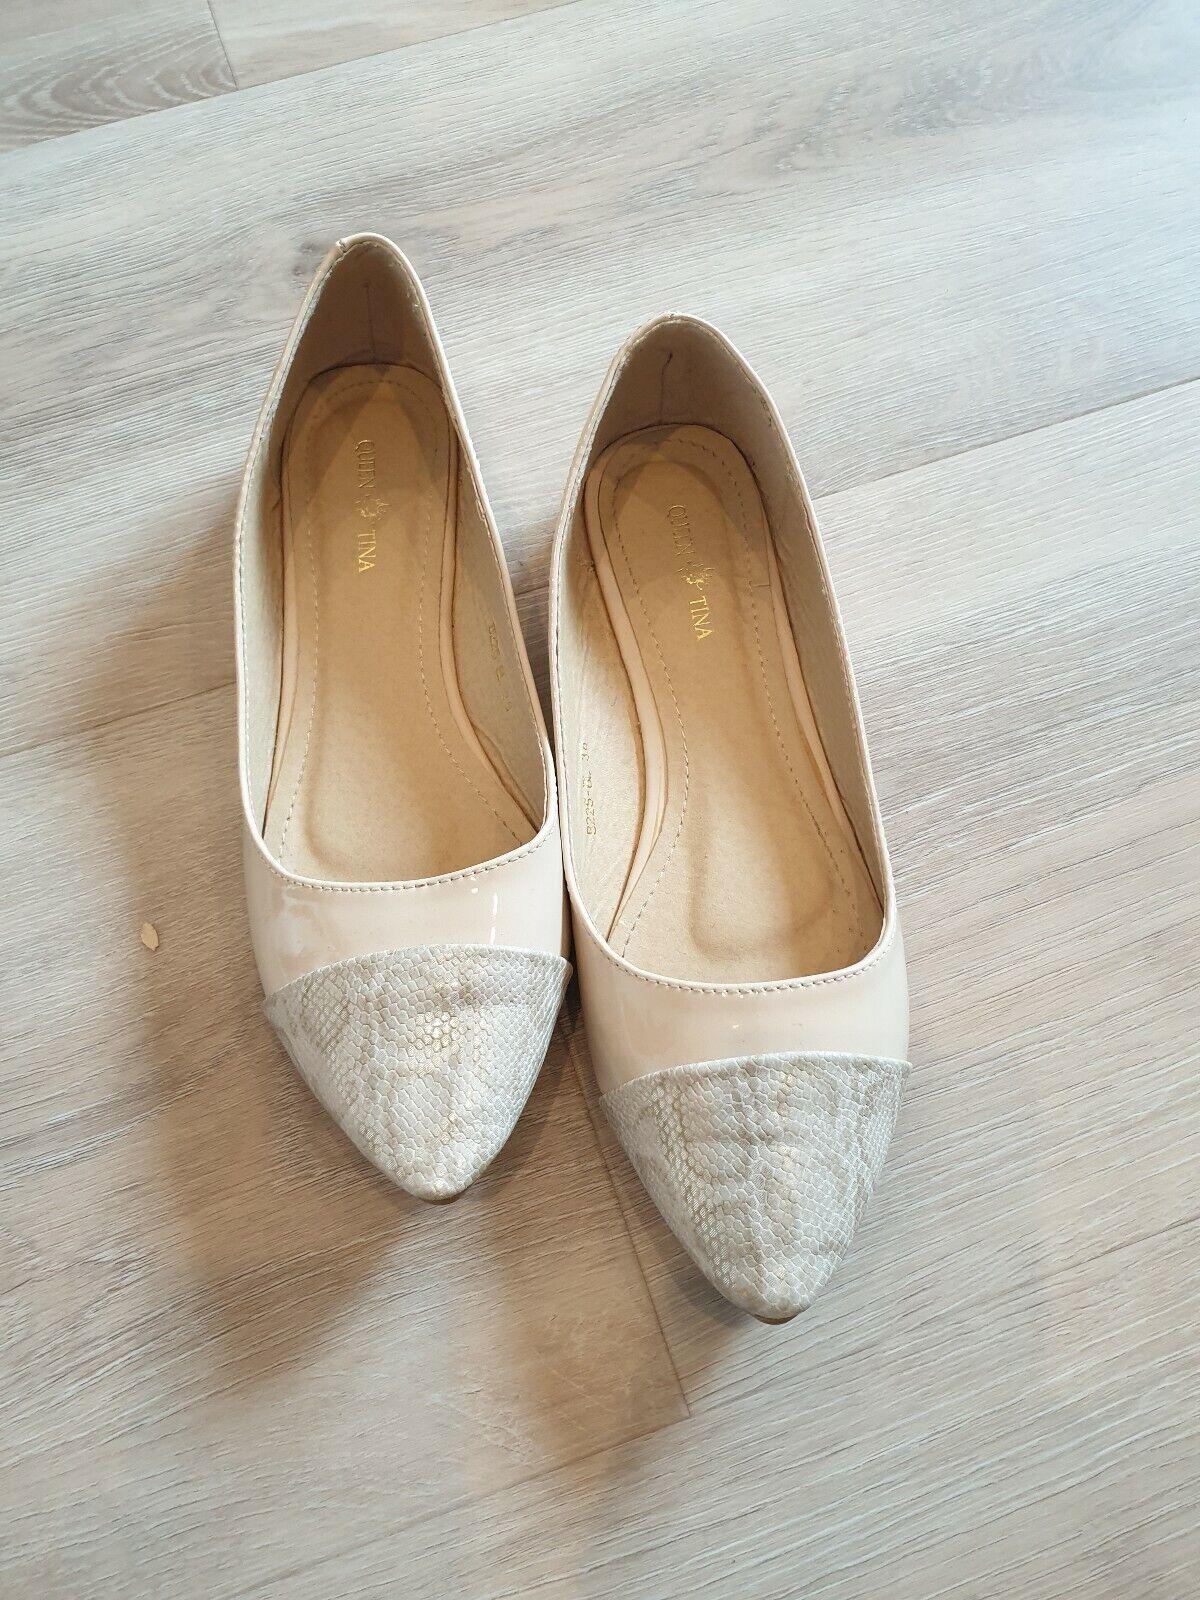 Ballerina Turnschuhe Slipper Elegant Damen Schuhe Gr. 38